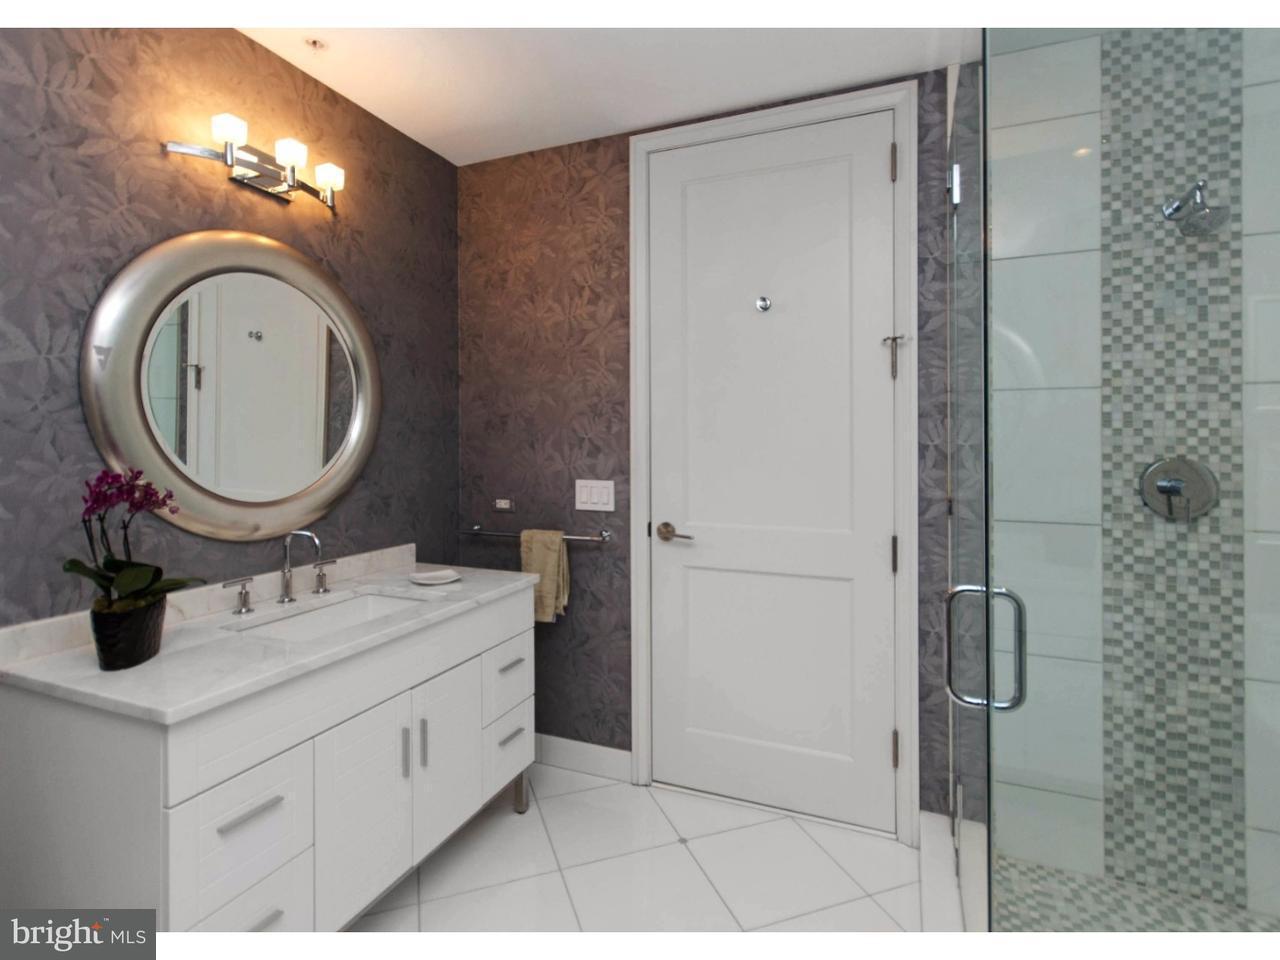 Additional photo for property listing at 1706 RITTENHOUSE SQ #801  Philadelphia, Pennsylvania 19103 Estados Unidos